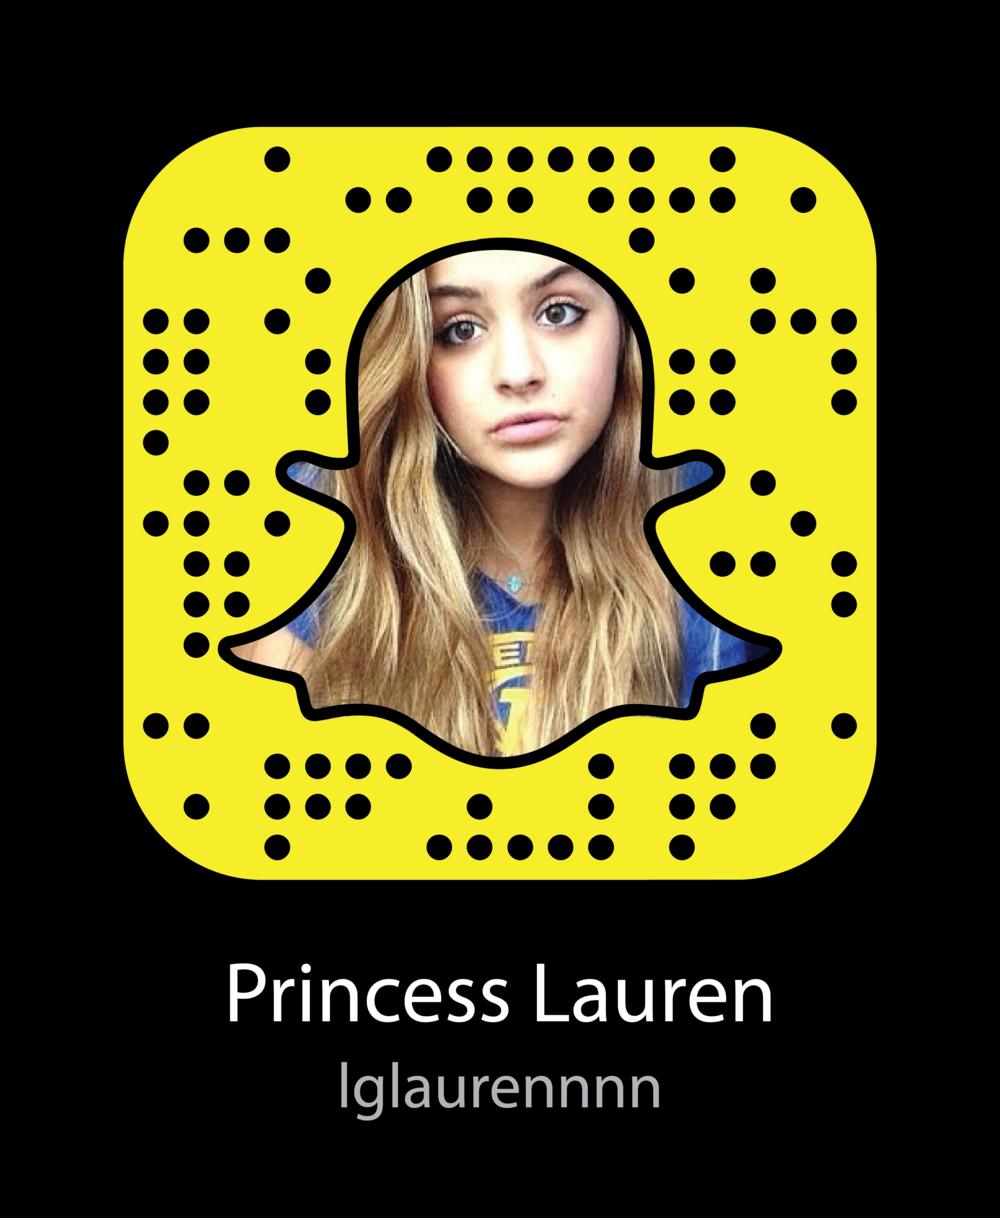 princess-lauren-violin-youtube-celebrity-snapchat-snapcode